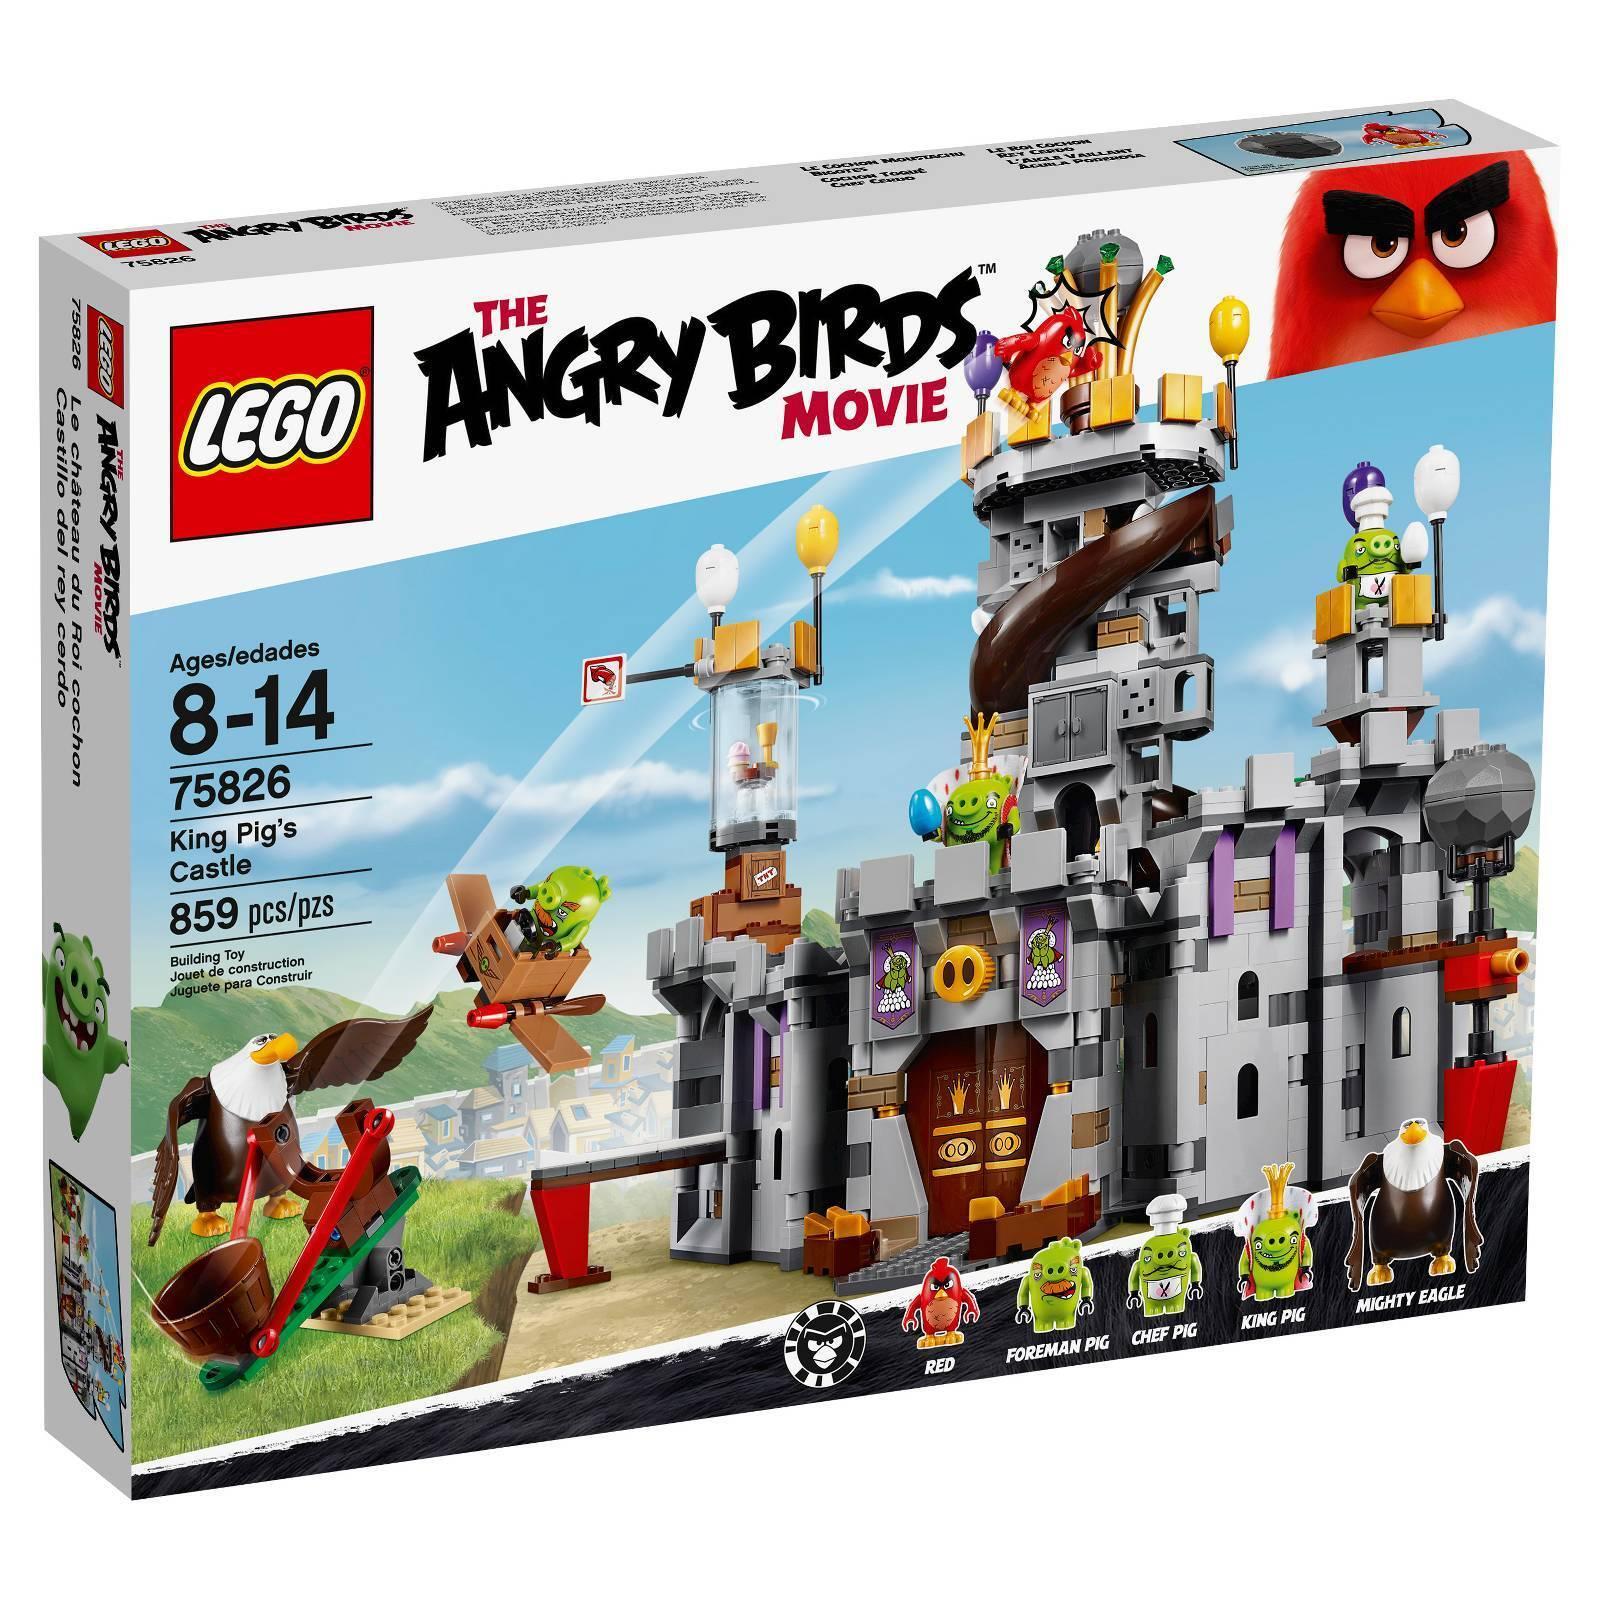 LEGO 75826  The Angry Birds Movie  King Pig's Castle 859 Pieces - nouveau - RETIrouge  magasin d'usine